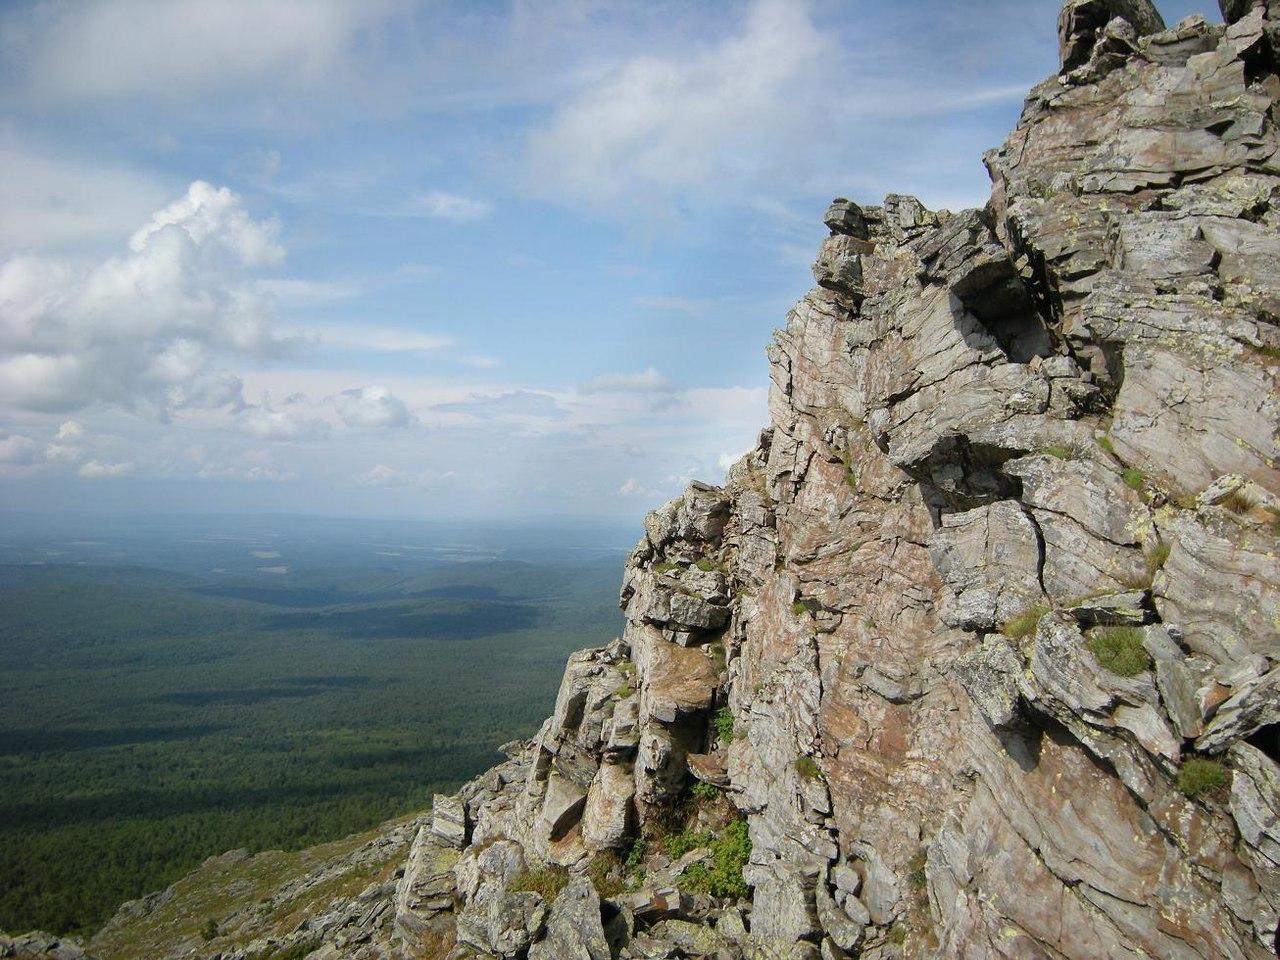 Афиша Екатеринбург Экскурсия на хребет Уреньга из Екатеринбурга